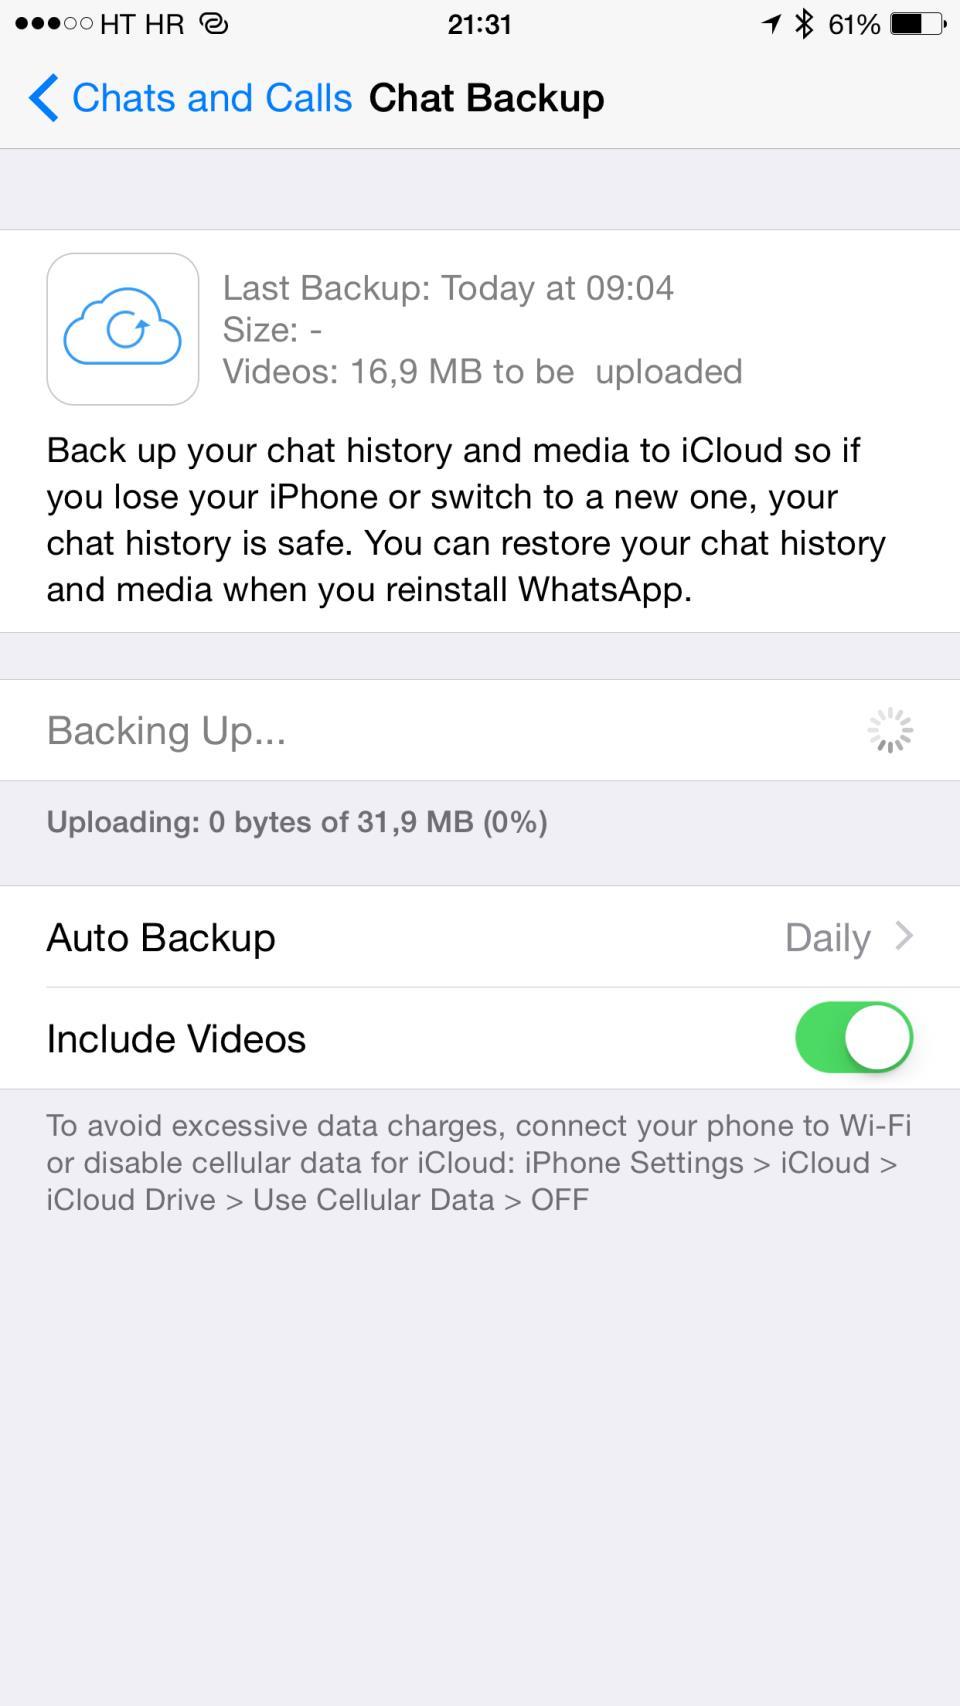 WhatsApp 2.12.5 for iOS iPhone screenshot 010